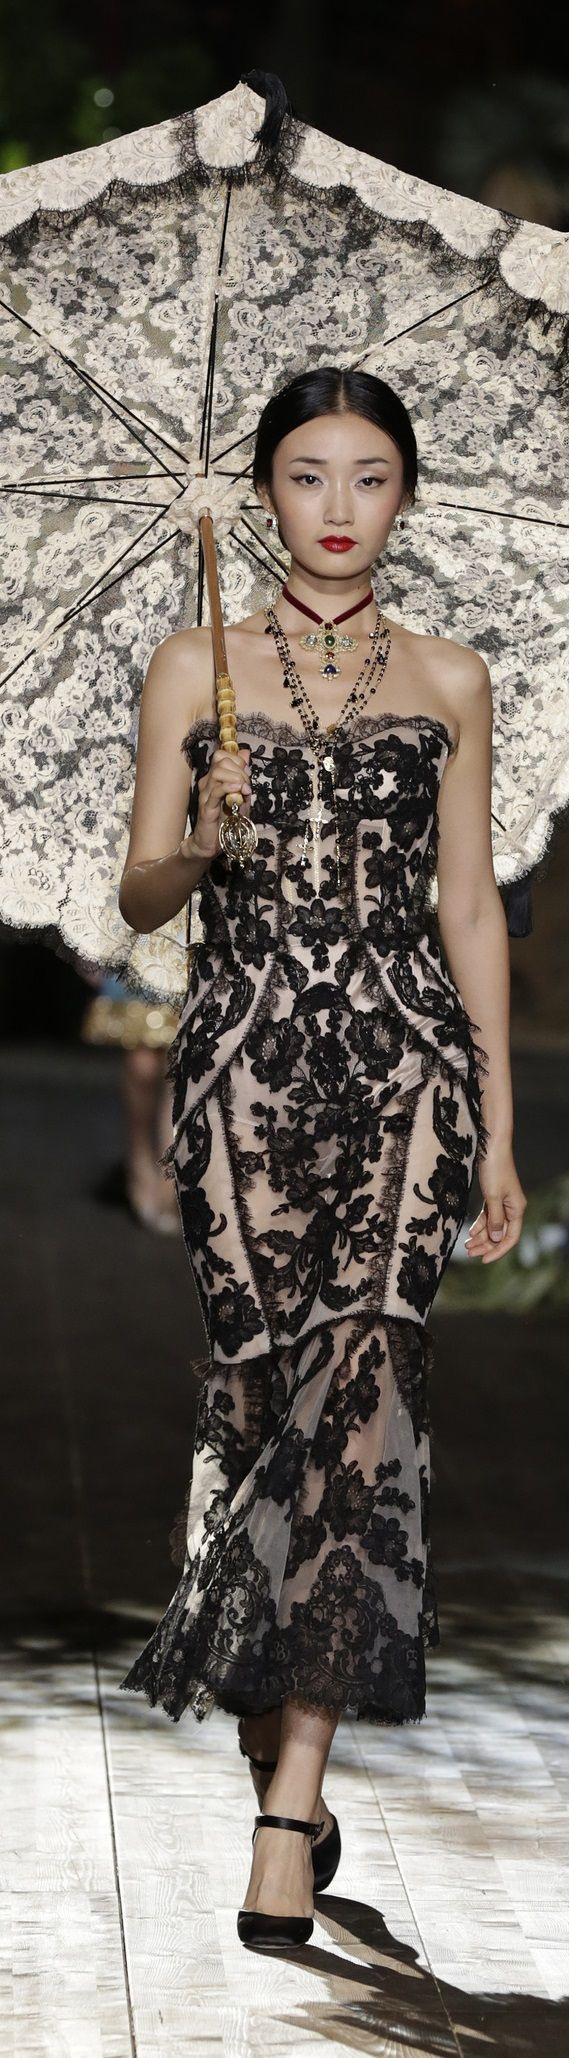 Dolce & Gabbana Alta Moda ~ Exotic + Elegant, Couture Black Embroidered…